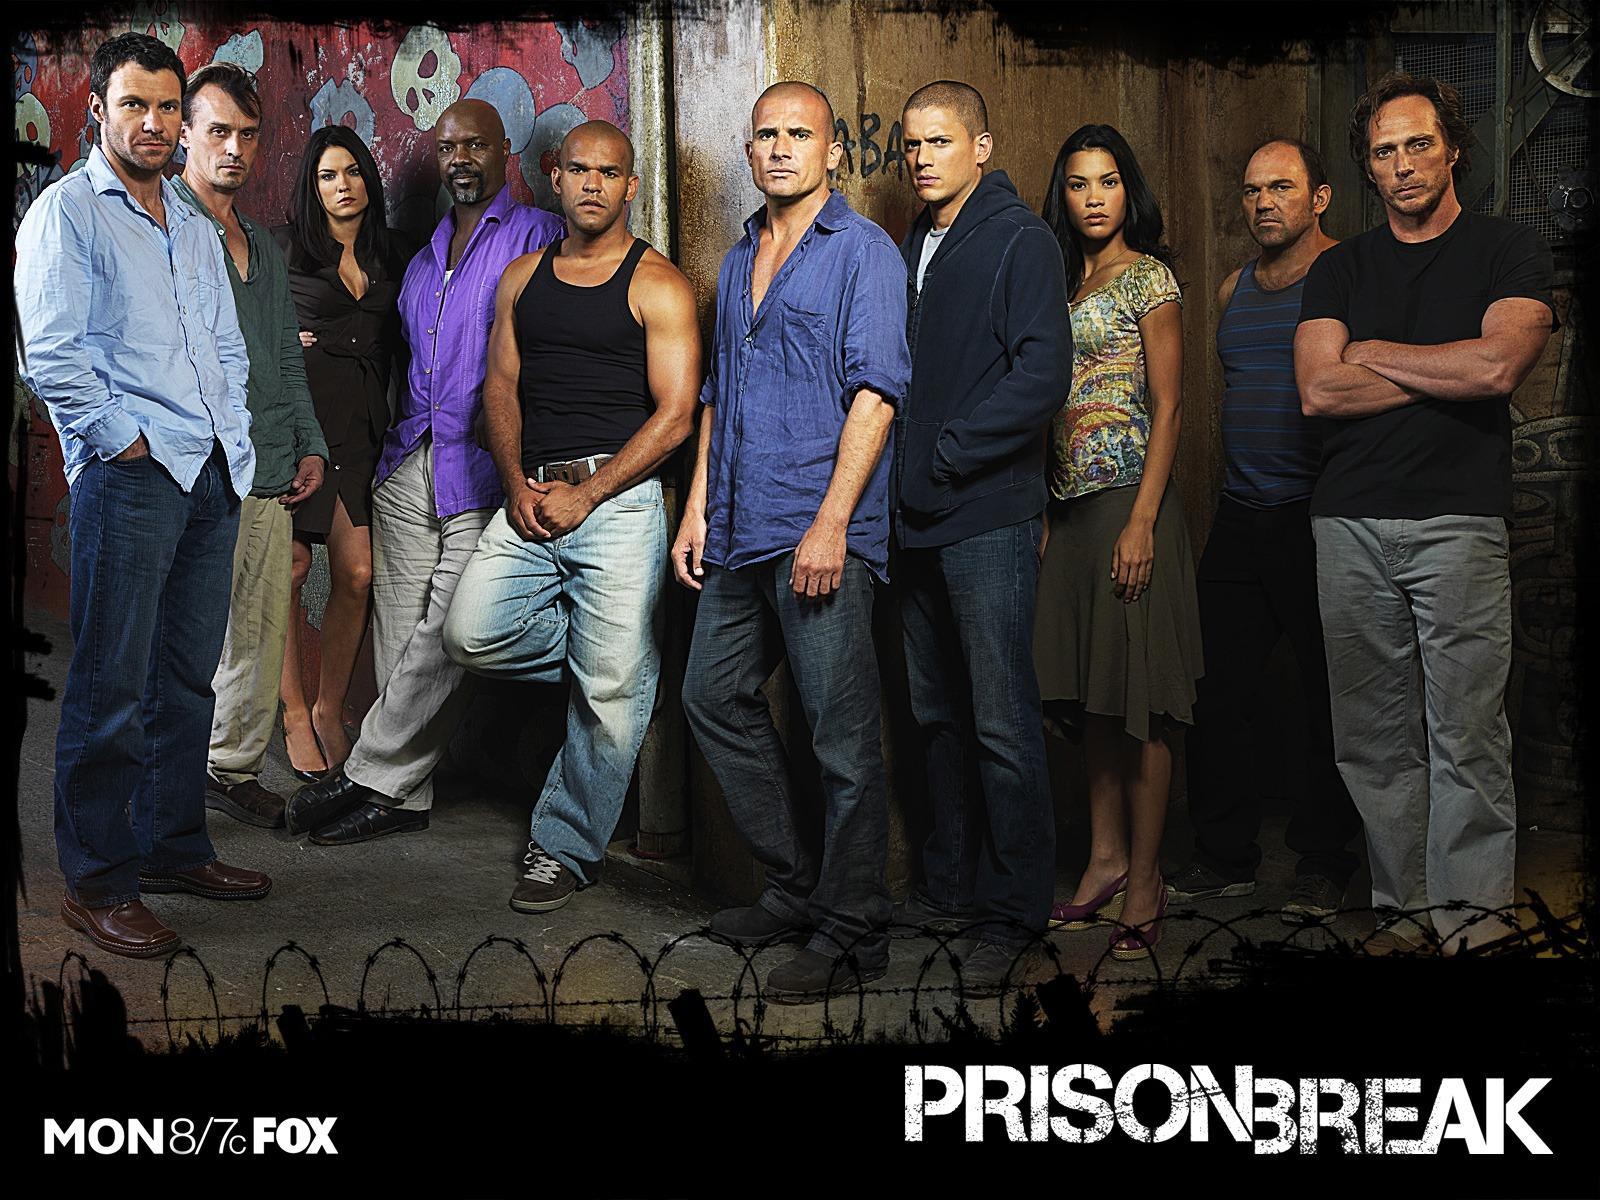 prison break wallpaper, free wallpaper downloads - rebsays